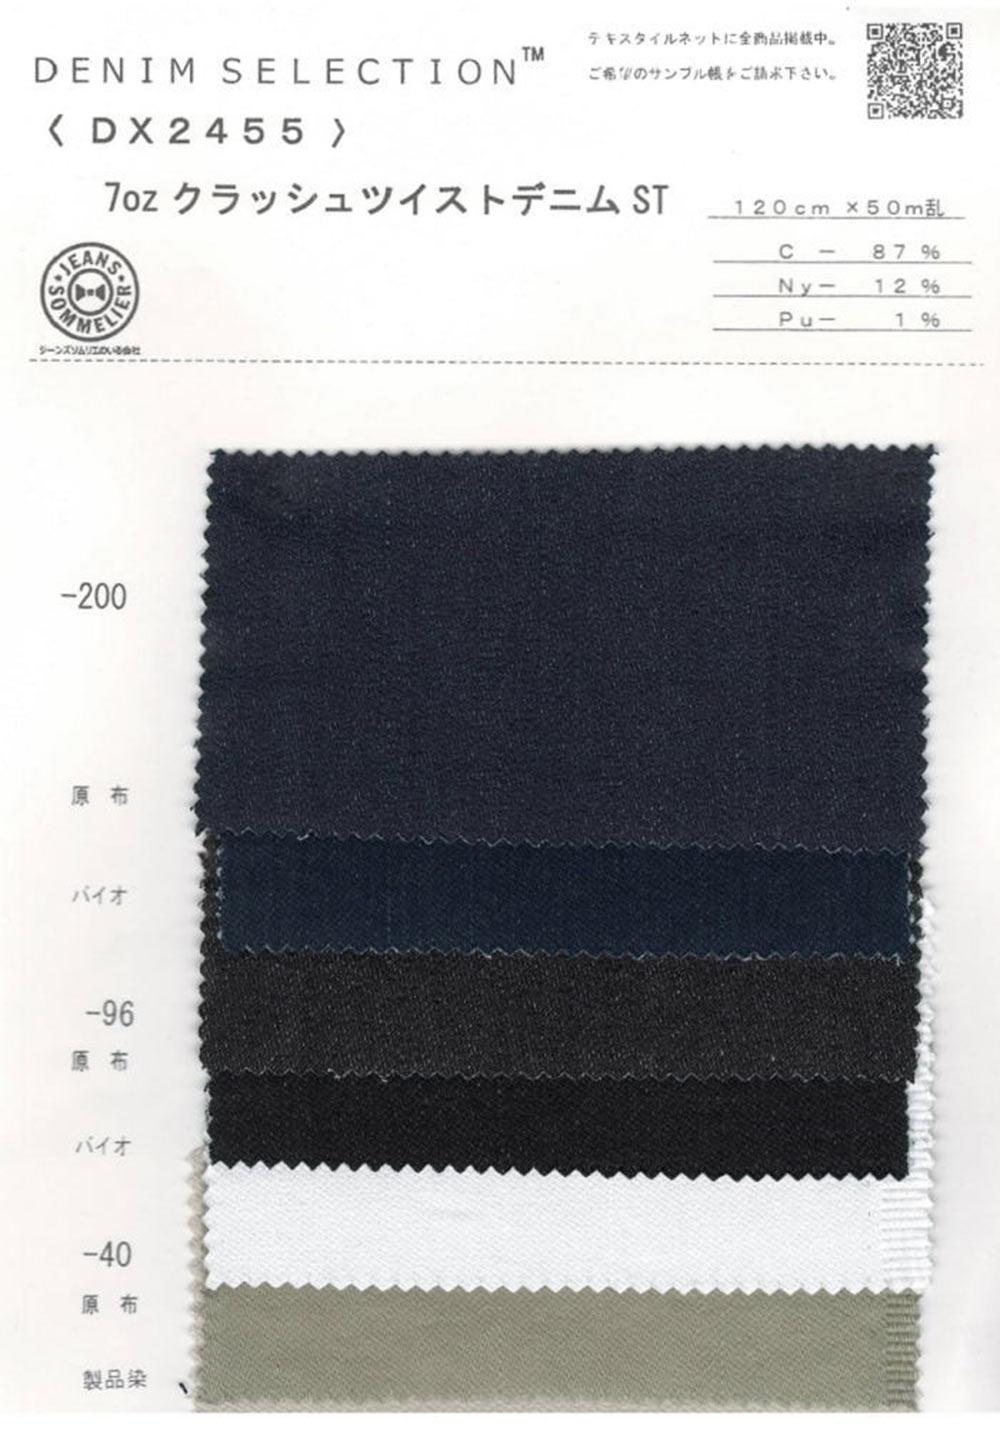 DX2455 7オンスクラッシュツイストデニム[生地] ダックテキスタイル/オークラ商事 - ApparelX アパレル資材卸通販